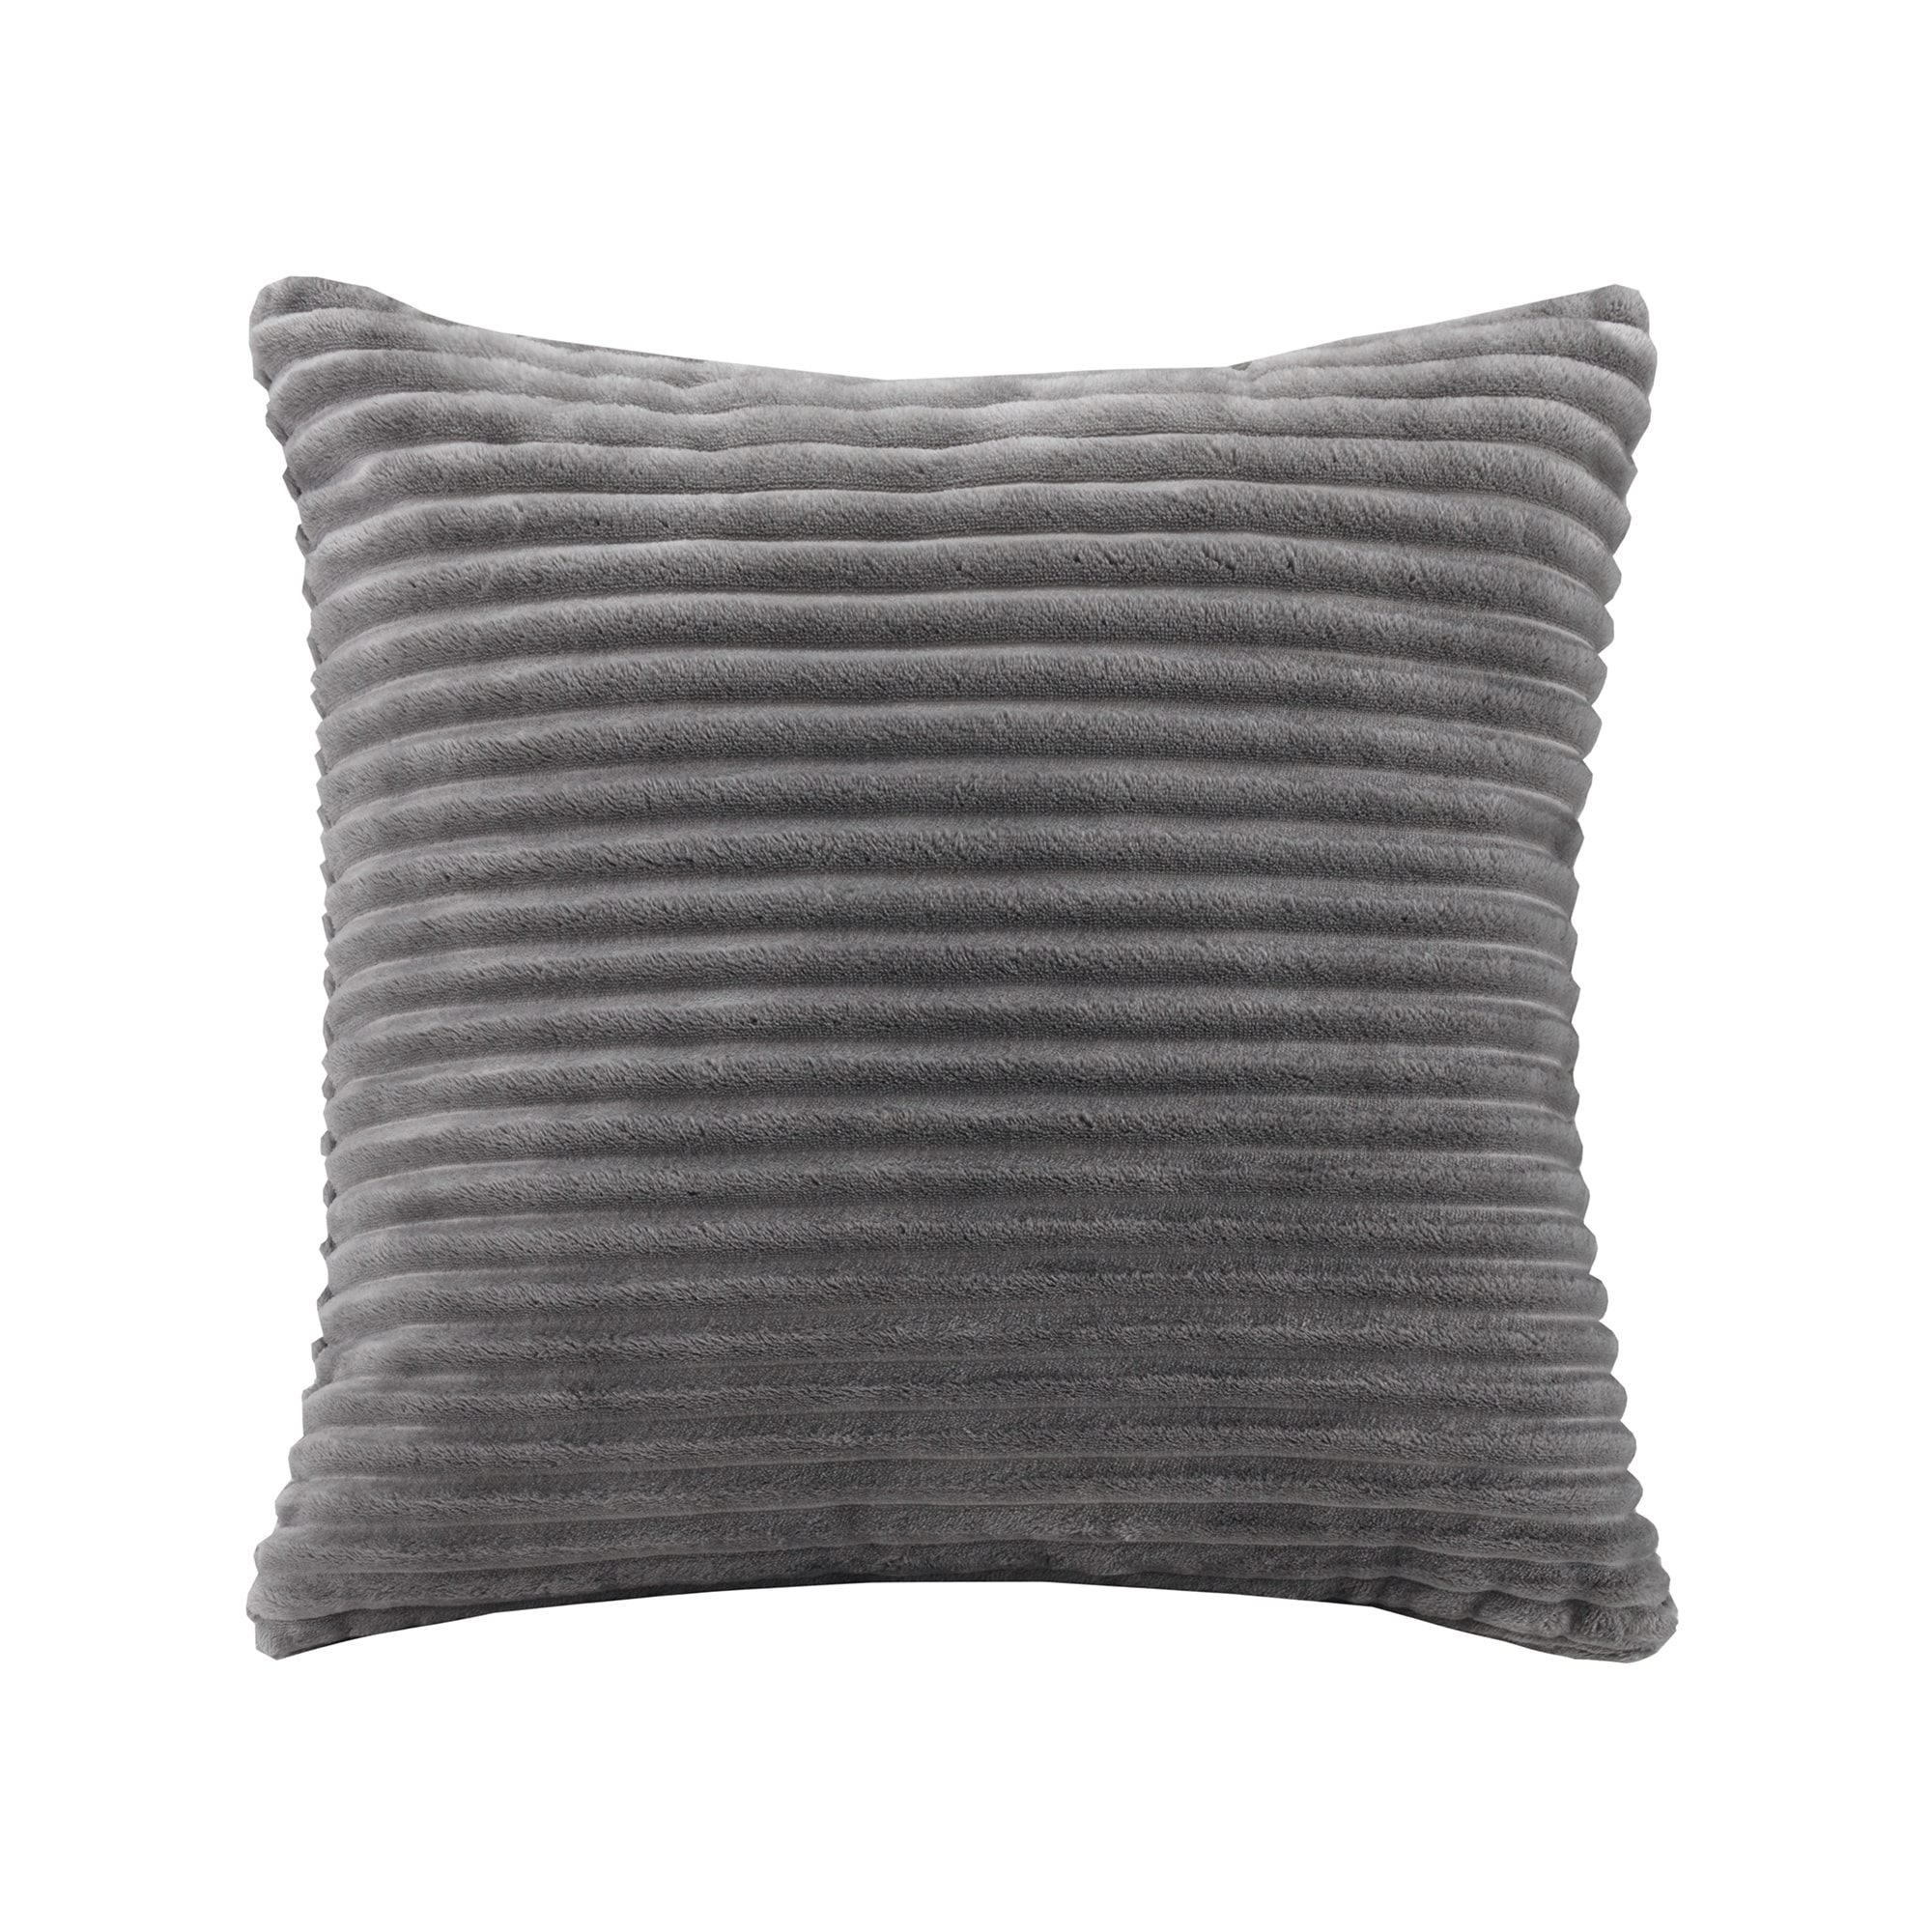 Premier Comfort Williams Corduroy Plush Square Throw Pillow 4-Color Options